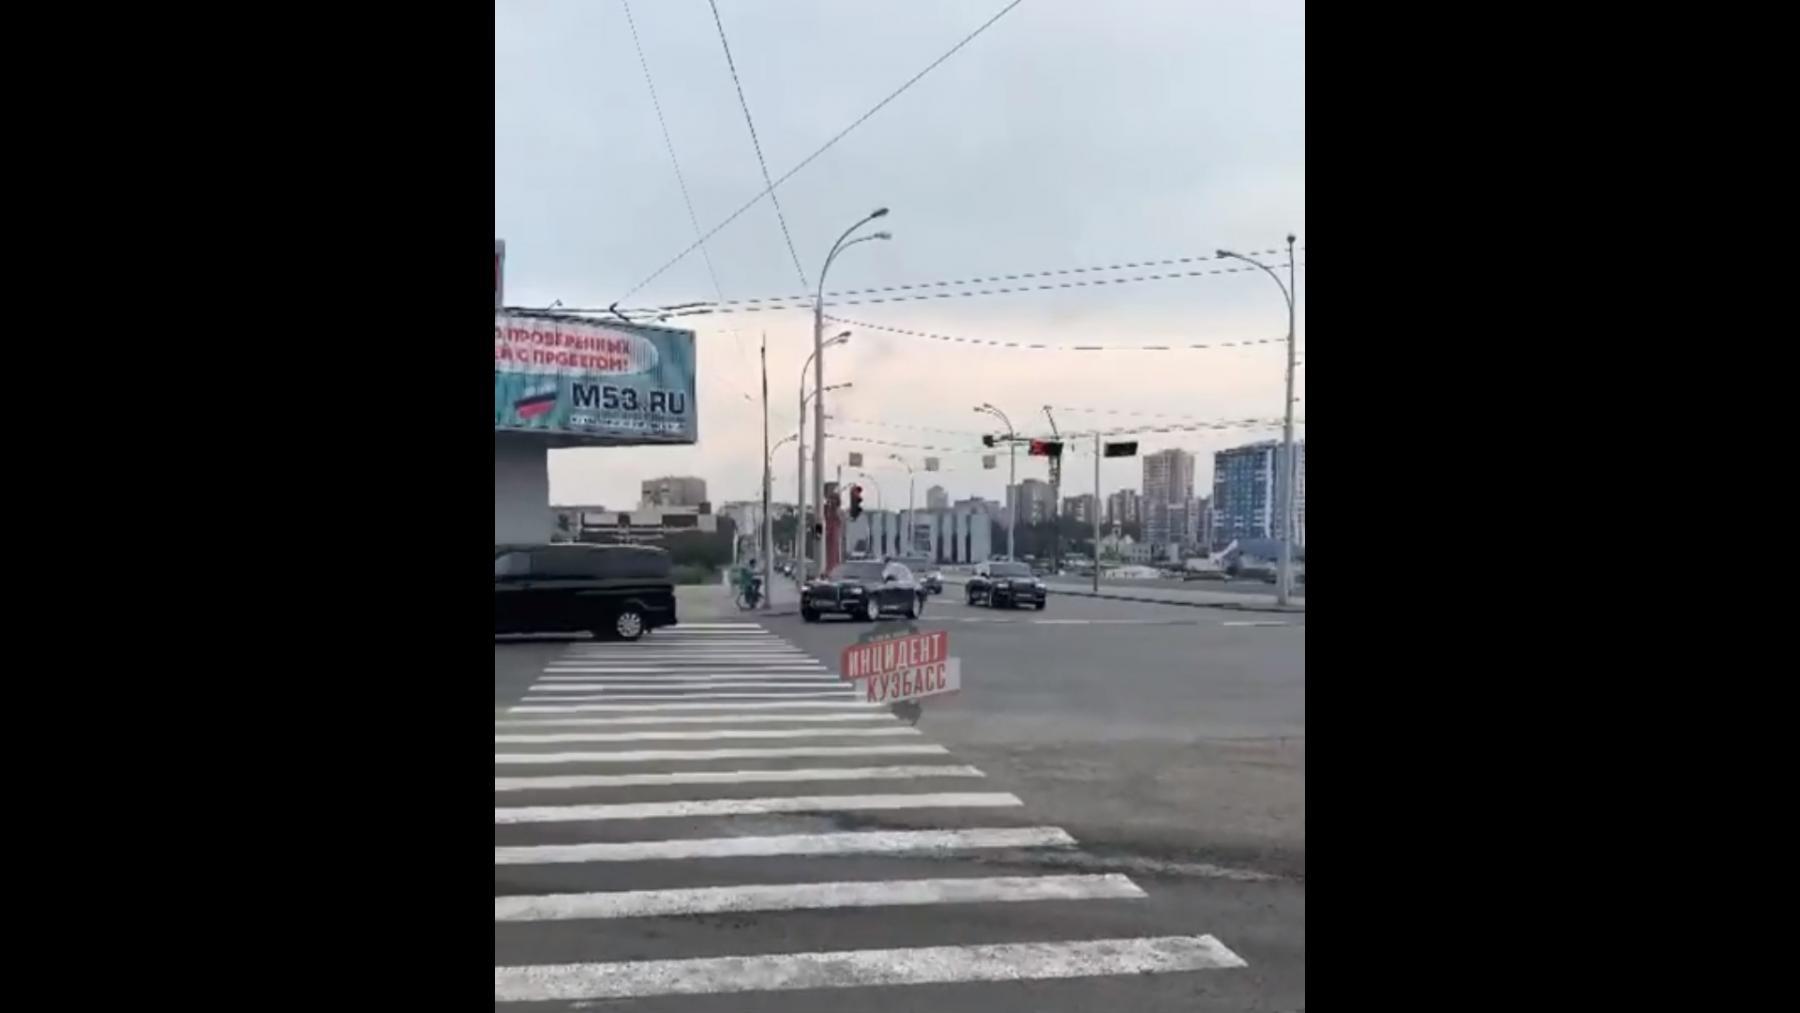 Фото Президент Путин прибыл в Кемерово 2